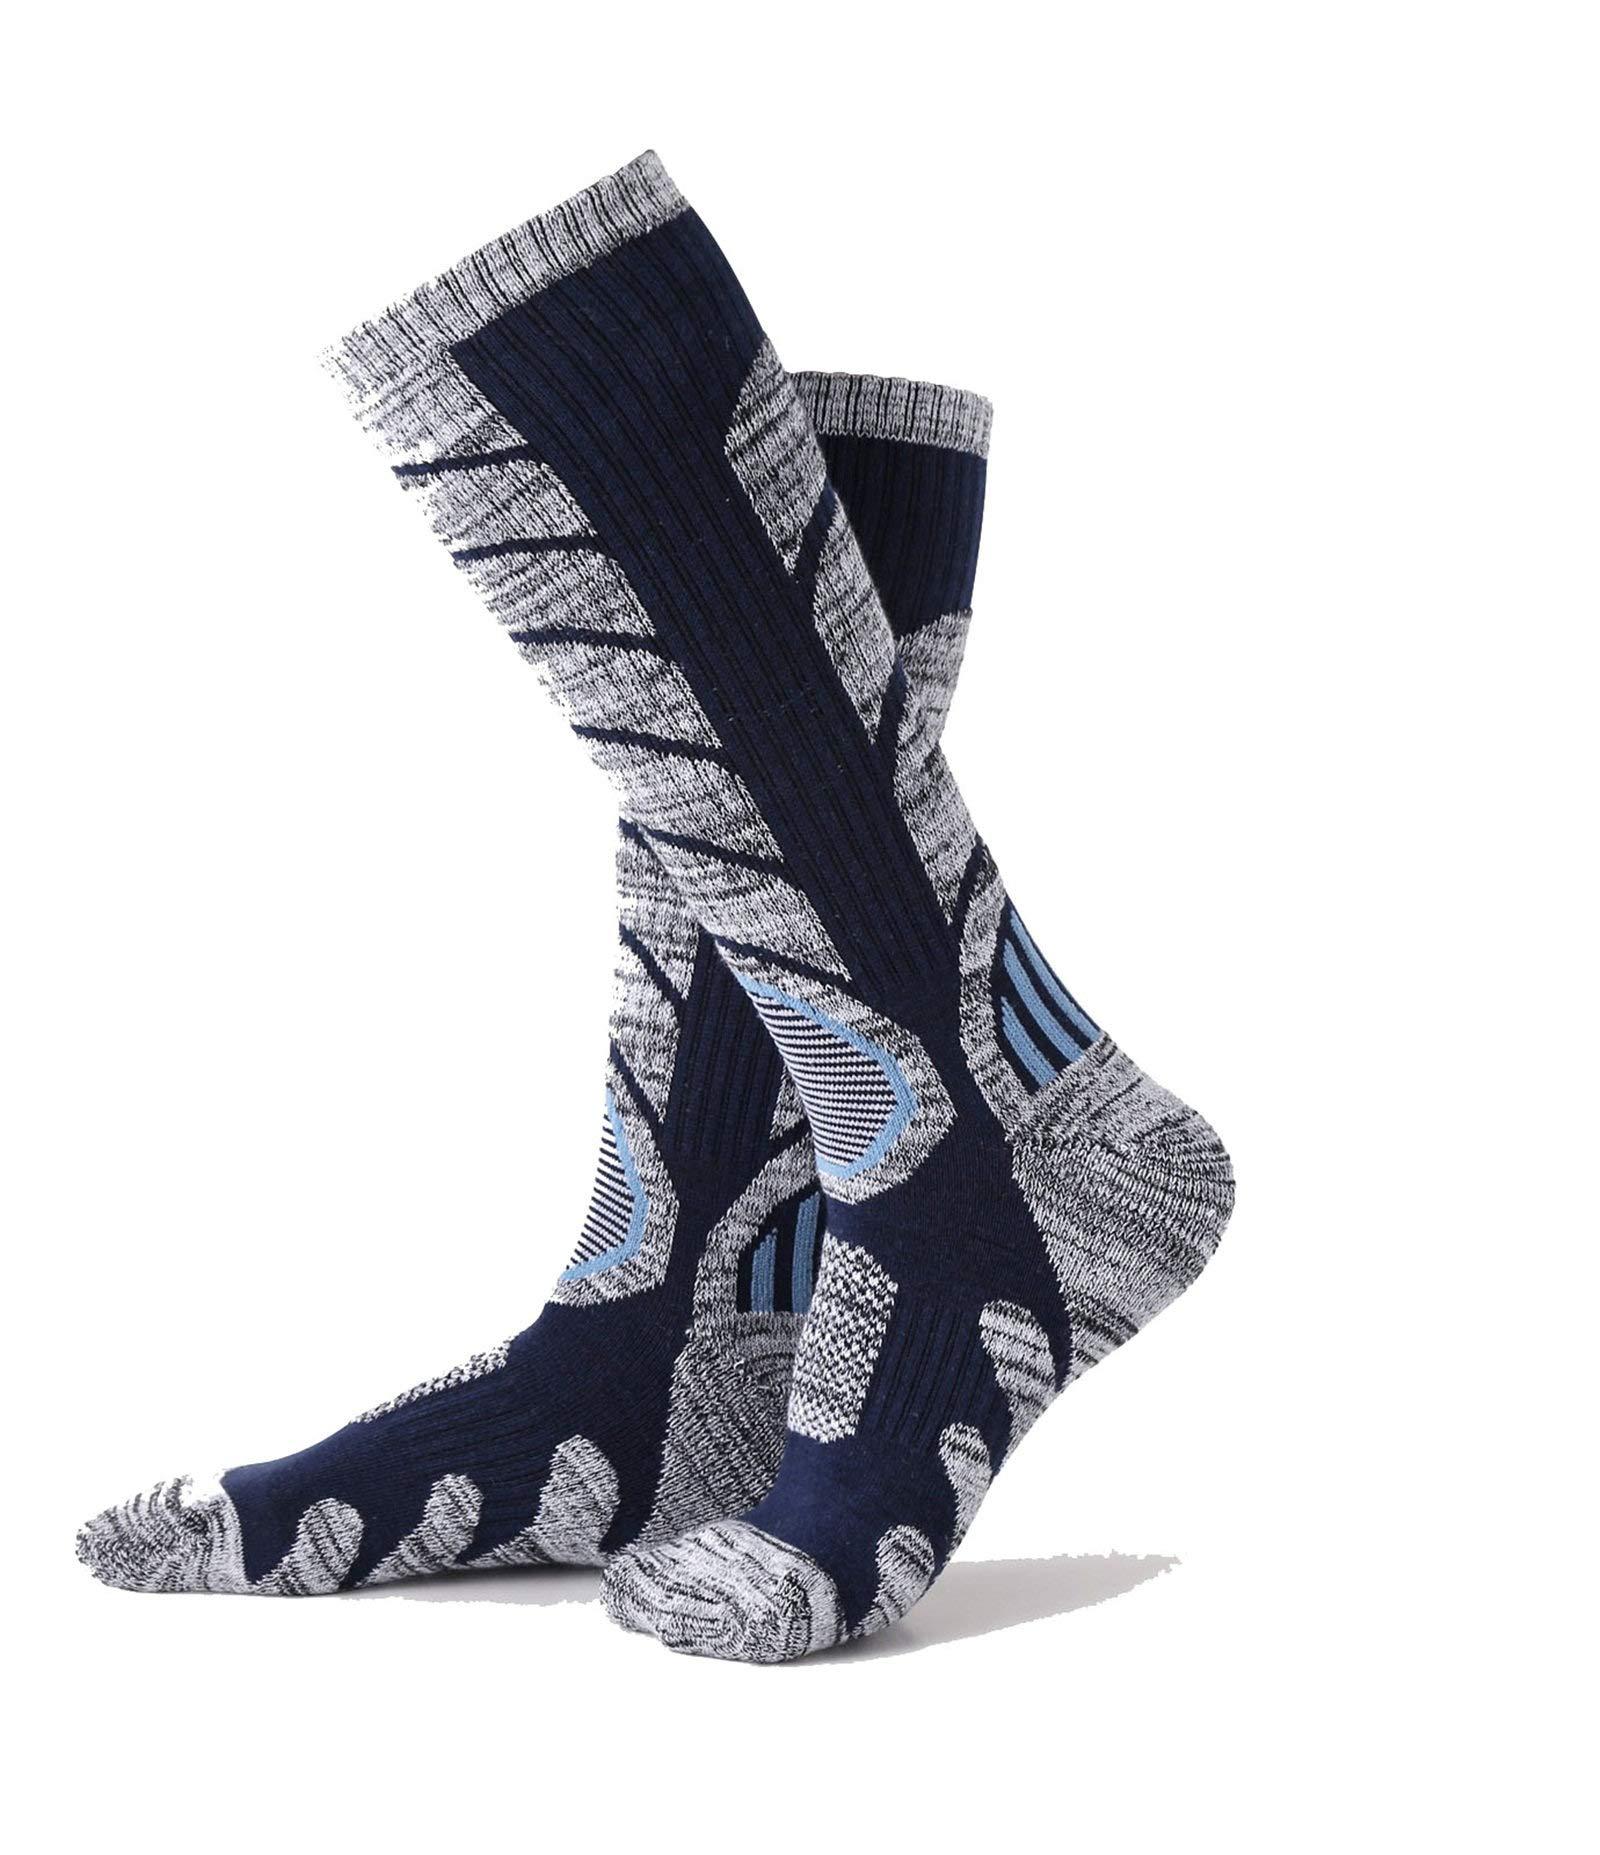 Socks Medium Long Towel Bottom Socks M Code Black Dark Gray Dark Blue Six Pairs of Each Color 2 Pairs